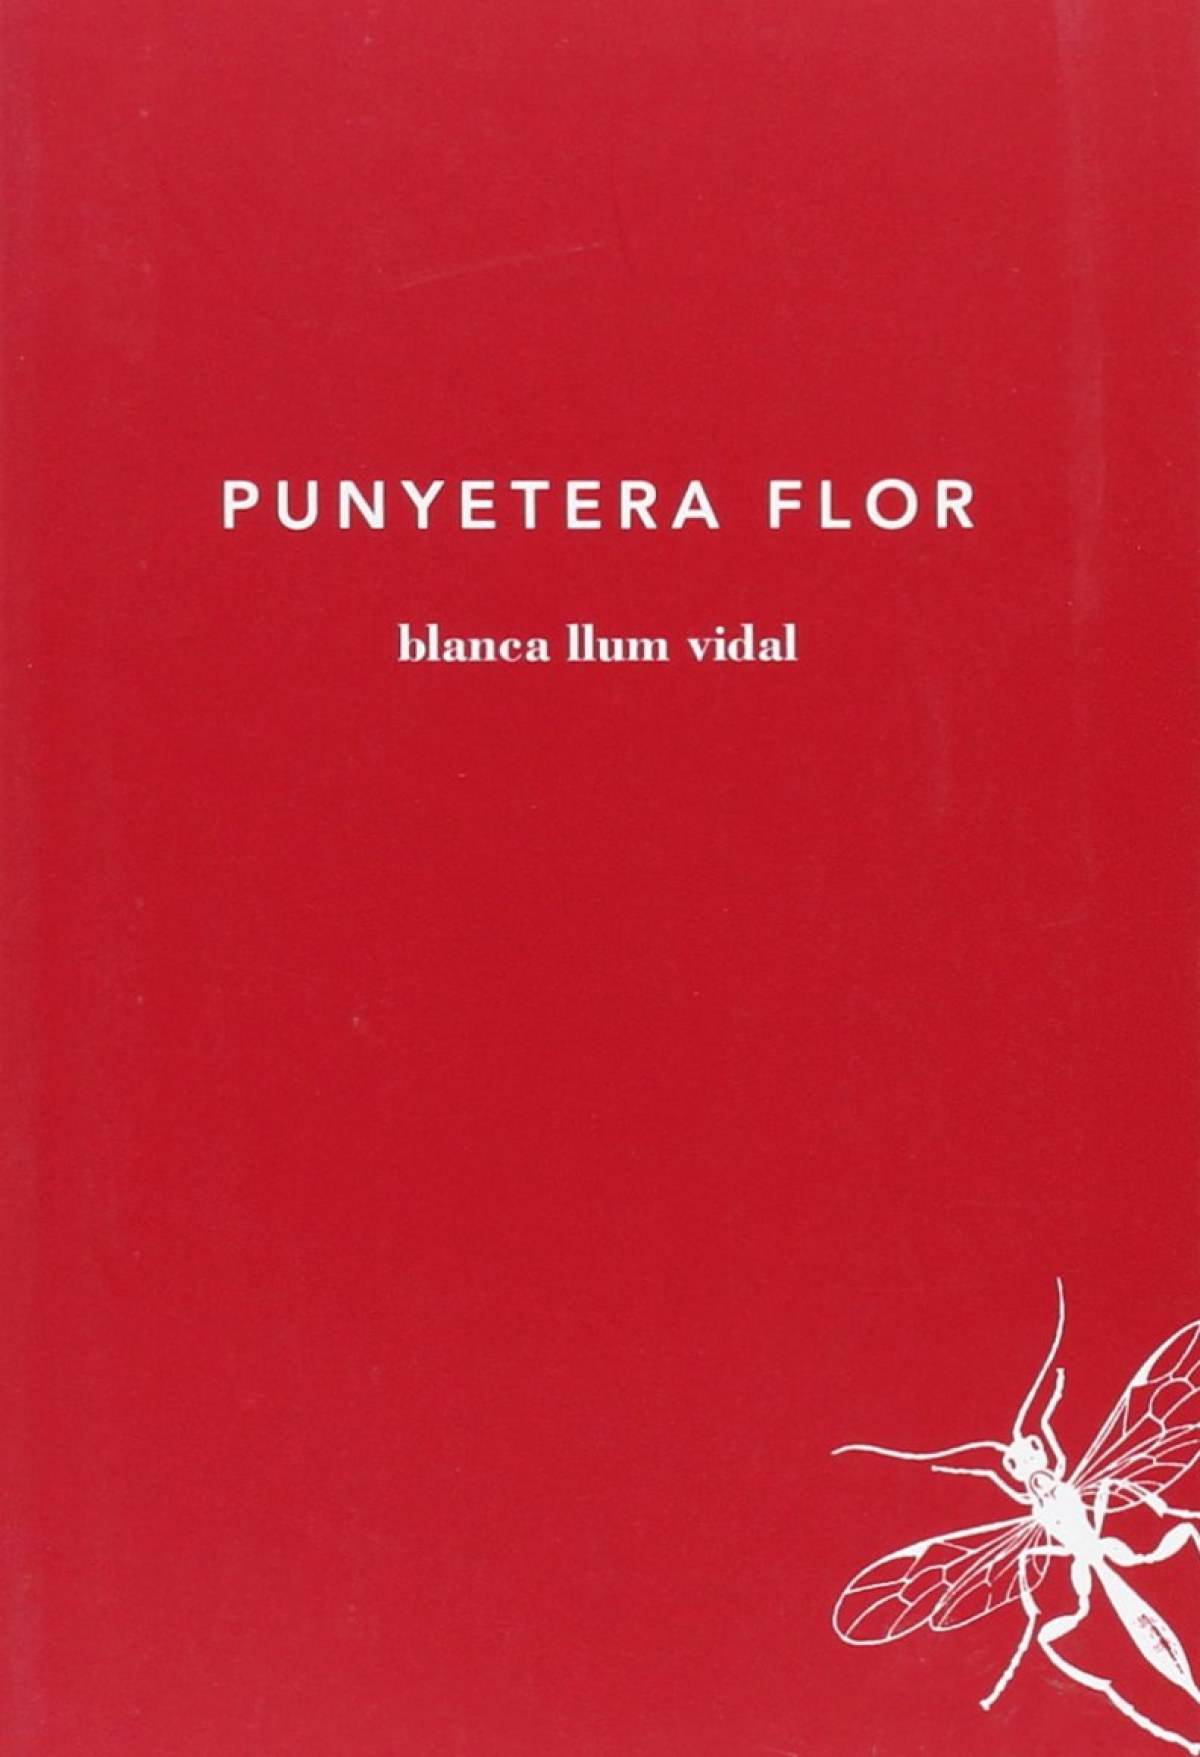 Punyetera flor 9788494289736